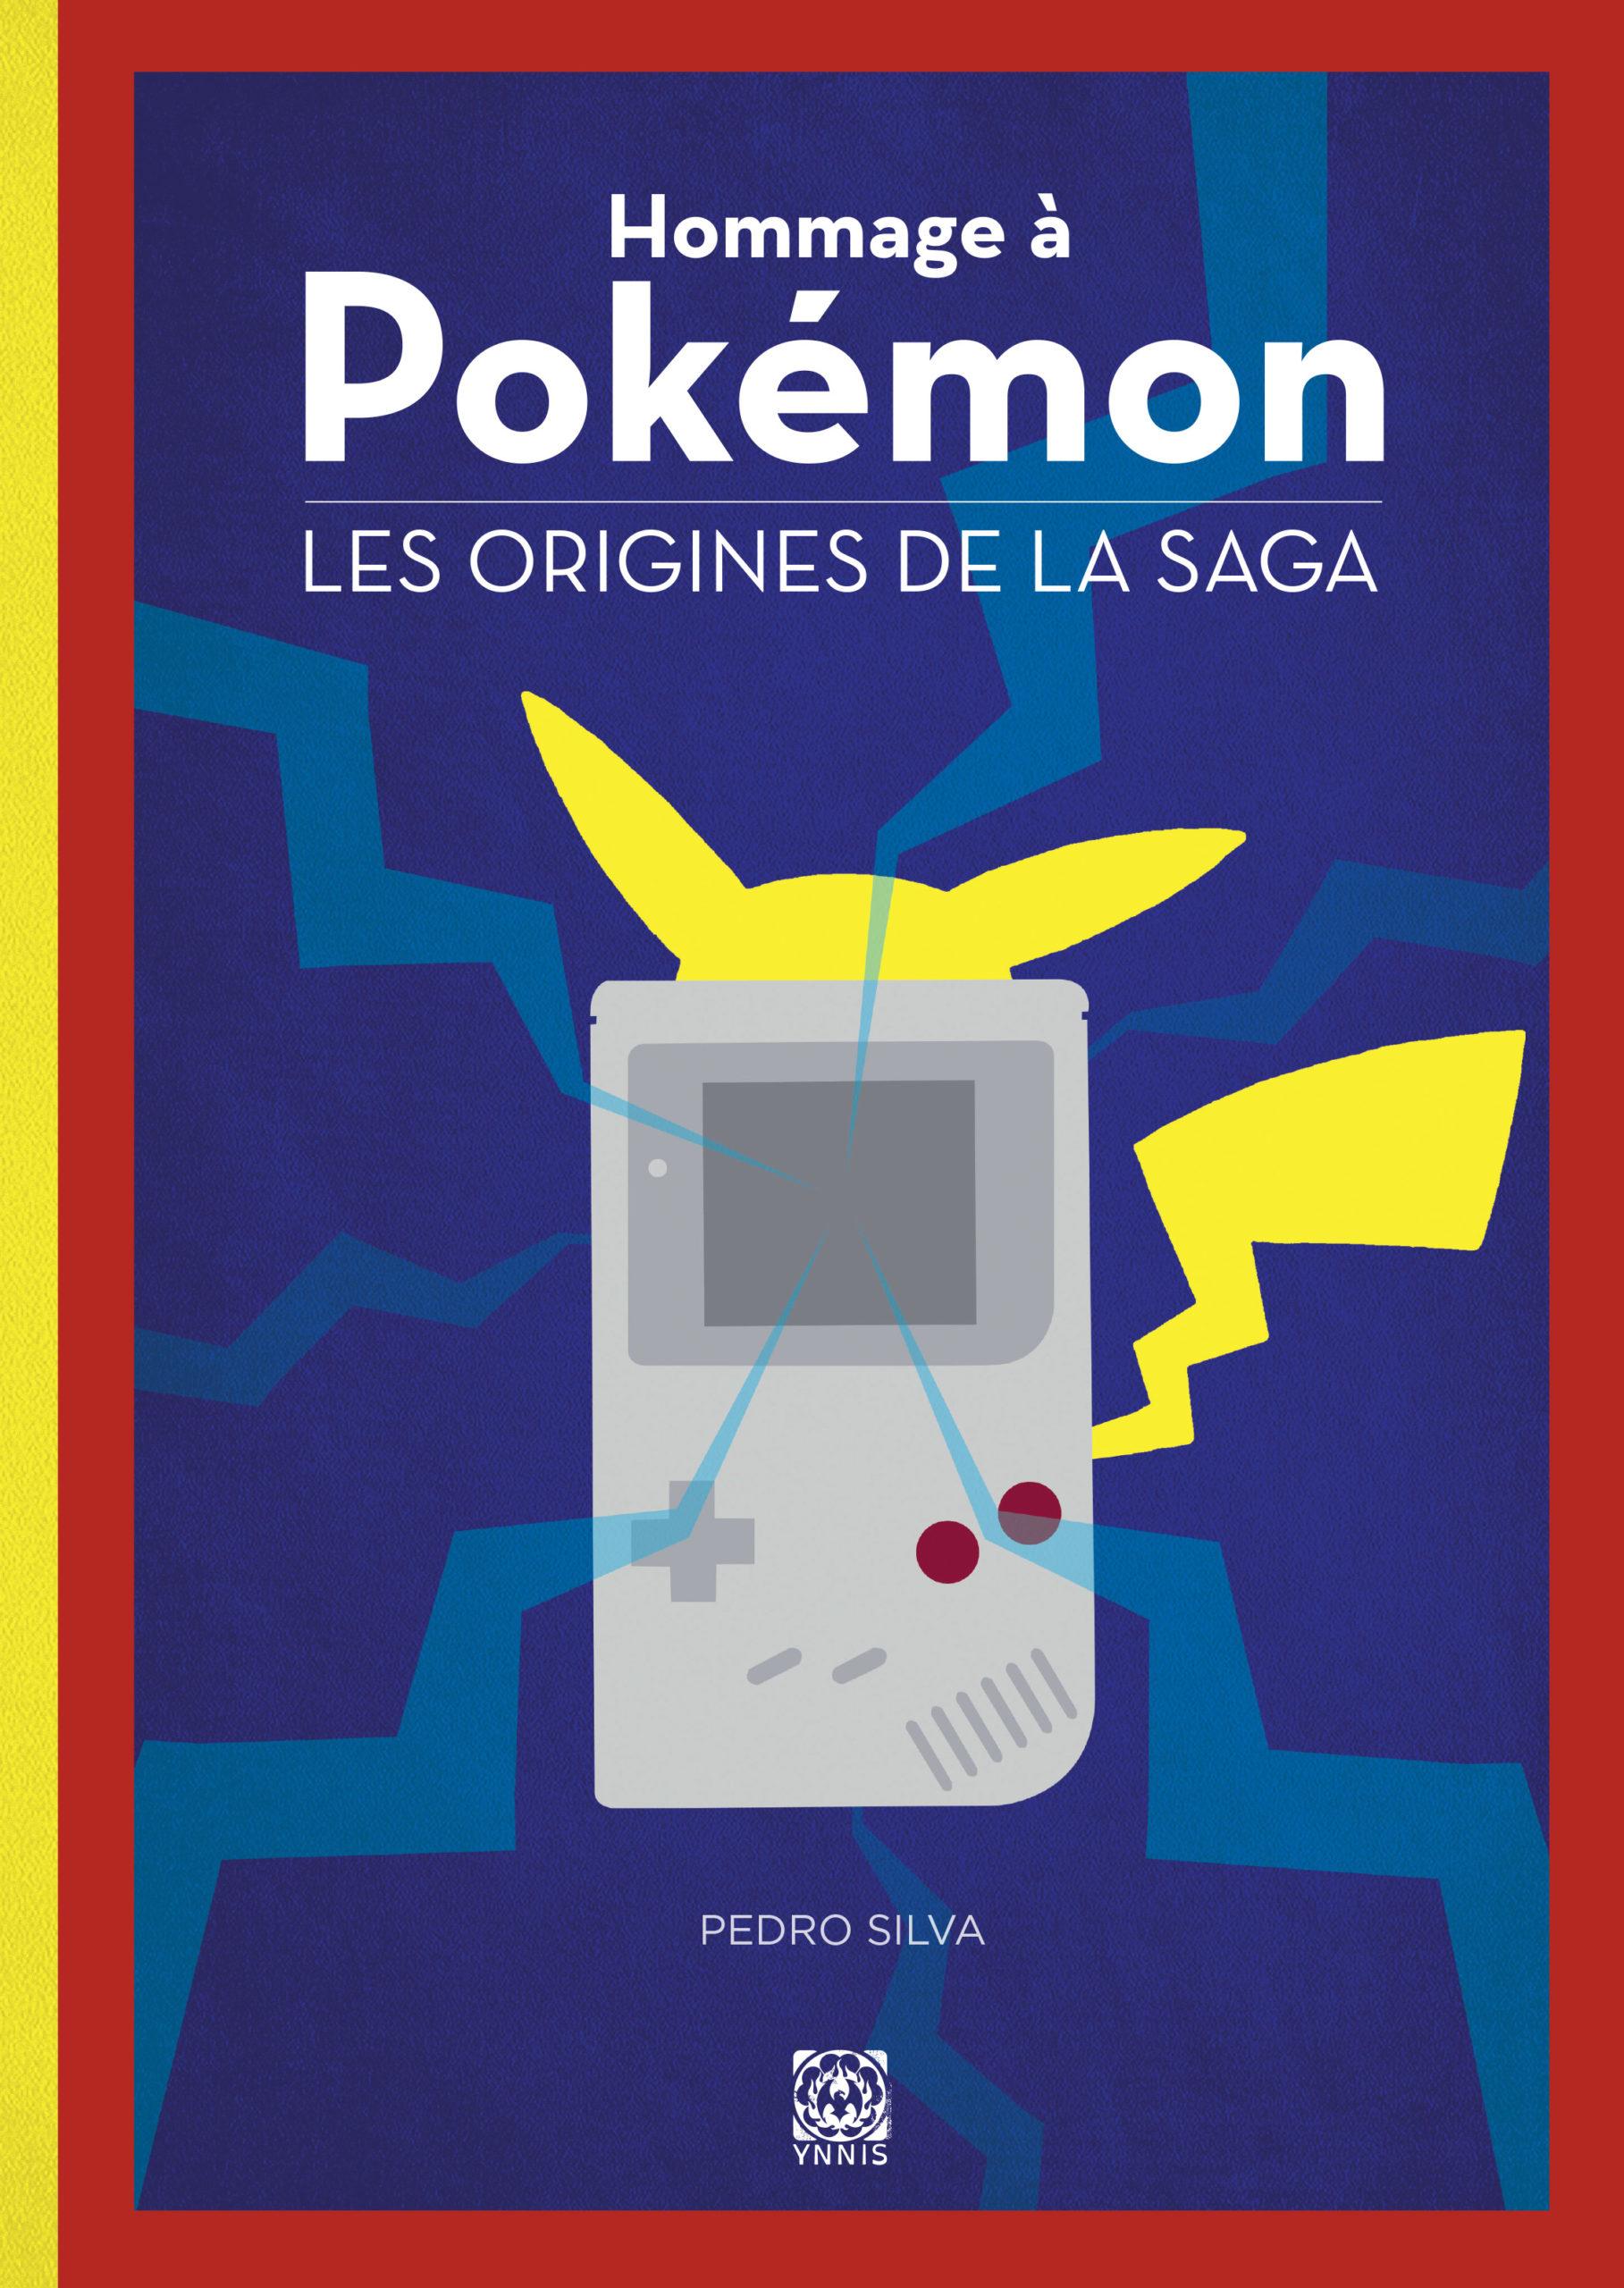 Hommage_a_pokemon-C1